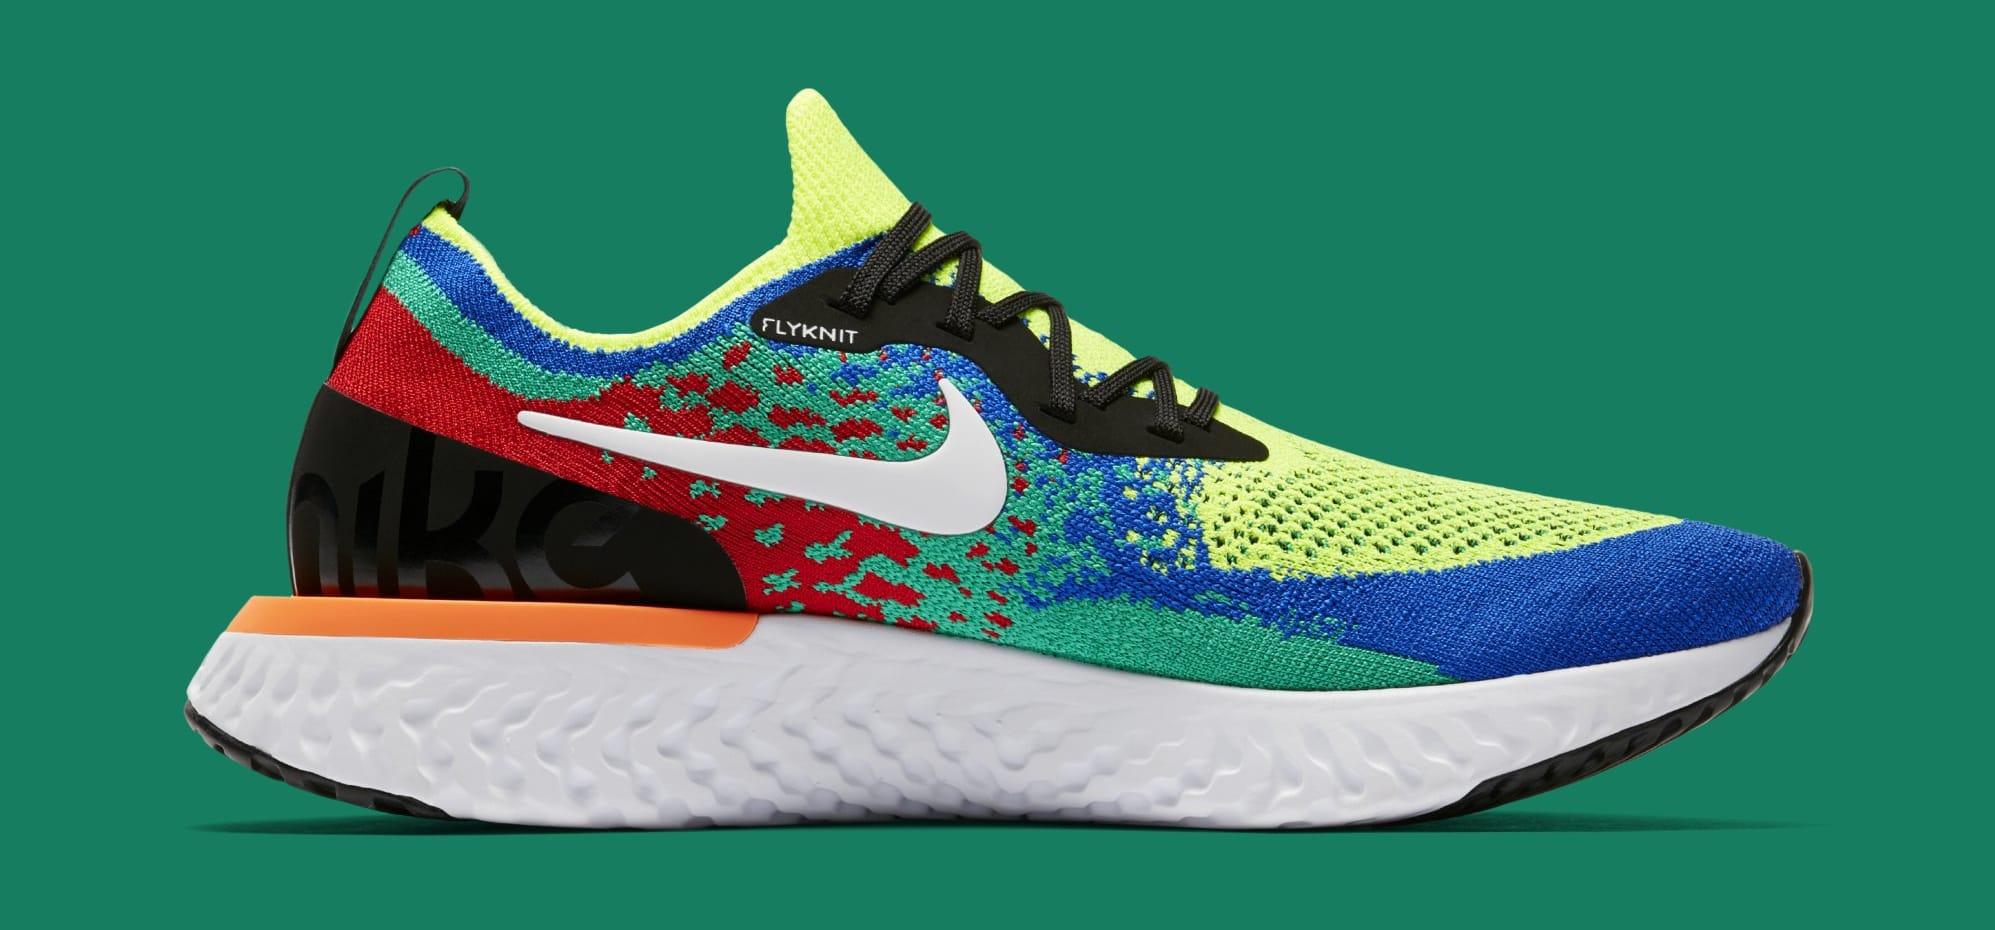 Nike Epic React Flyknit AT0054-700 (Medial)